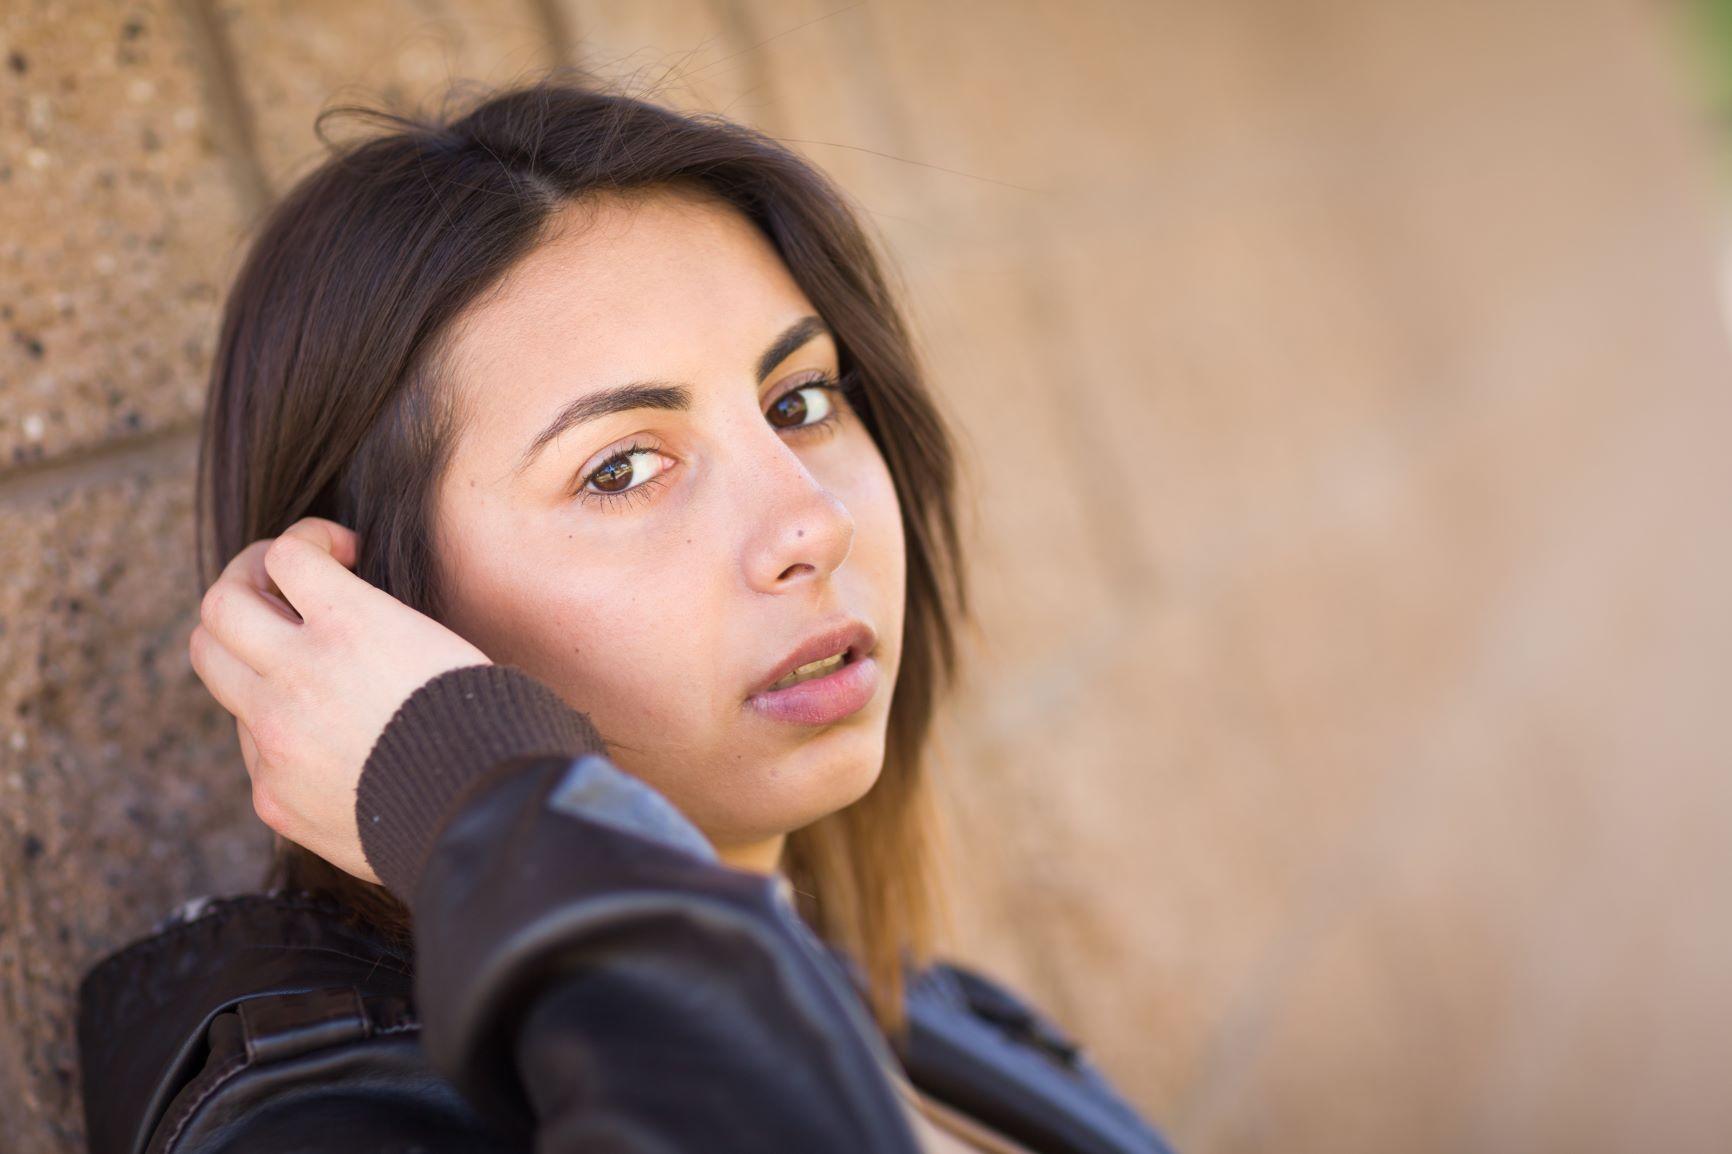 594 23338212 beautiful meloncholy mixed race young woman portrait light